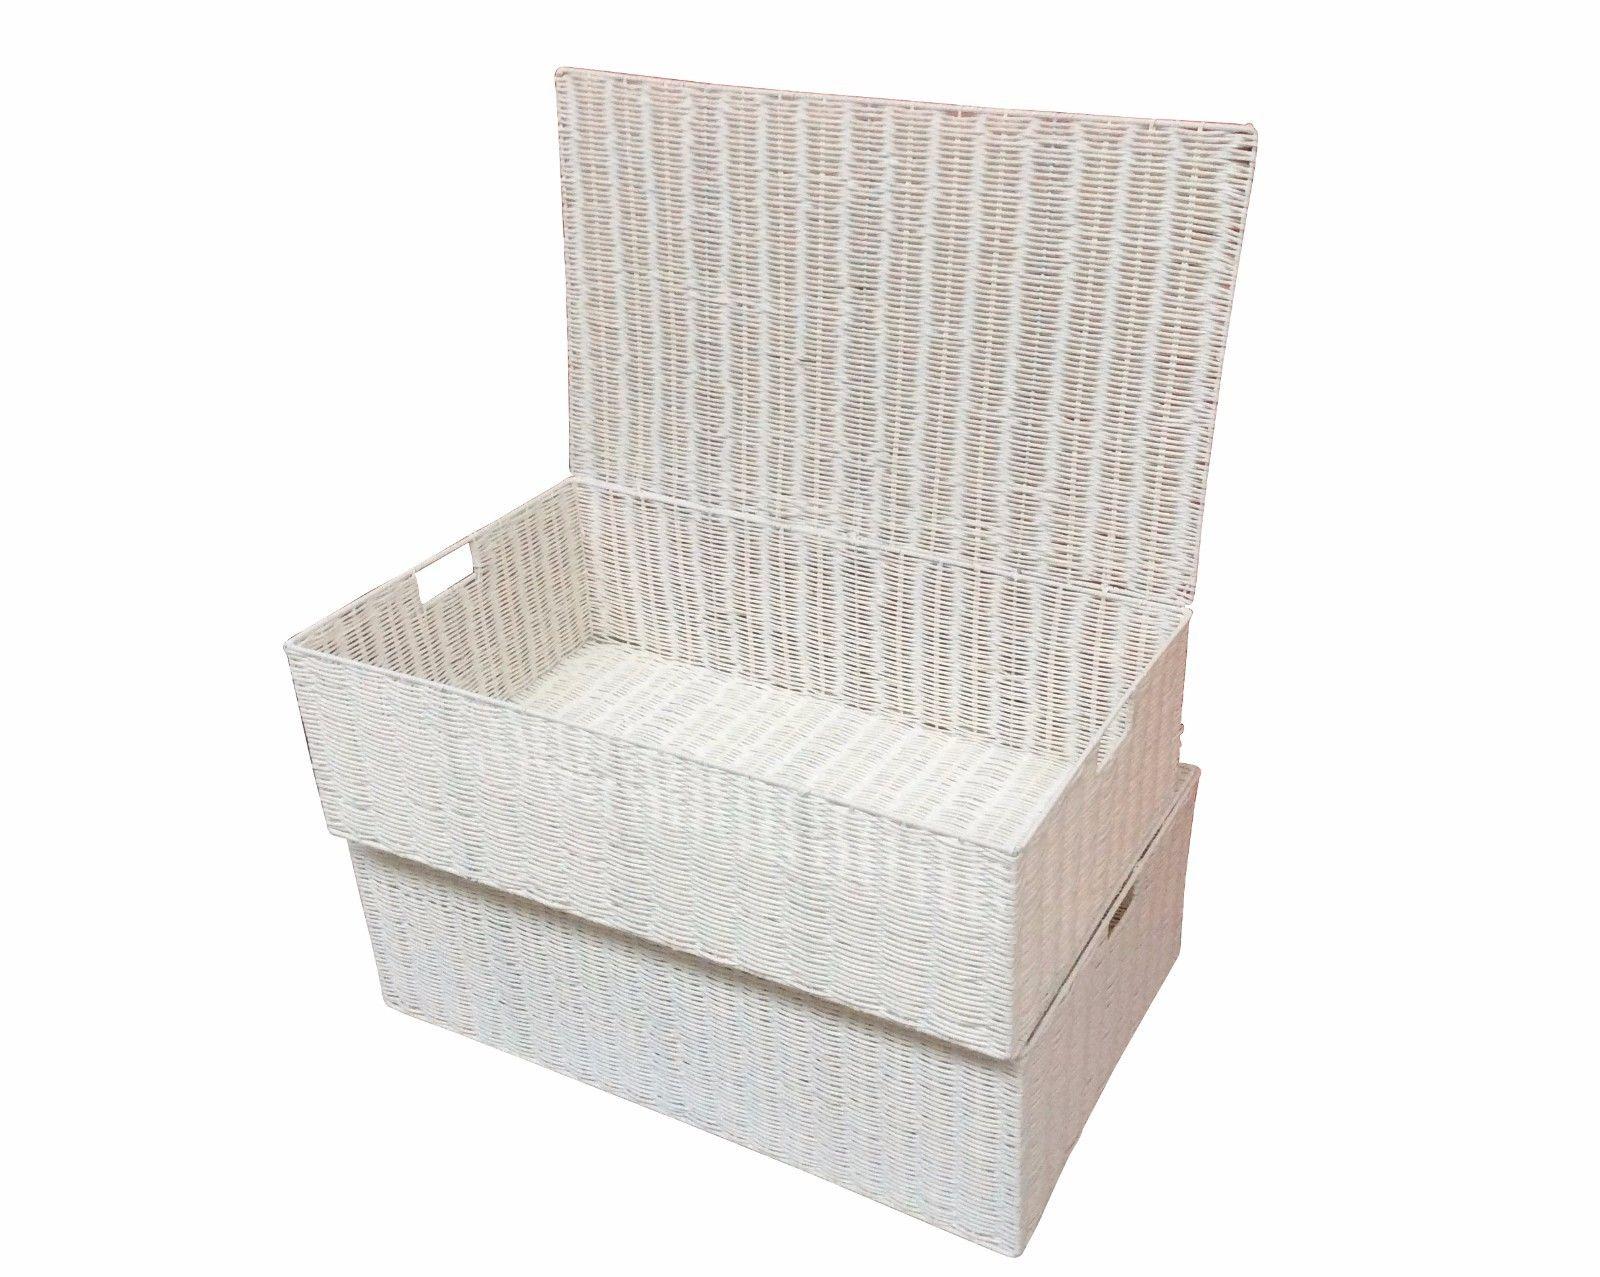 Arpan Storage Boxes & Lids eBay Home, Furniture & DIY